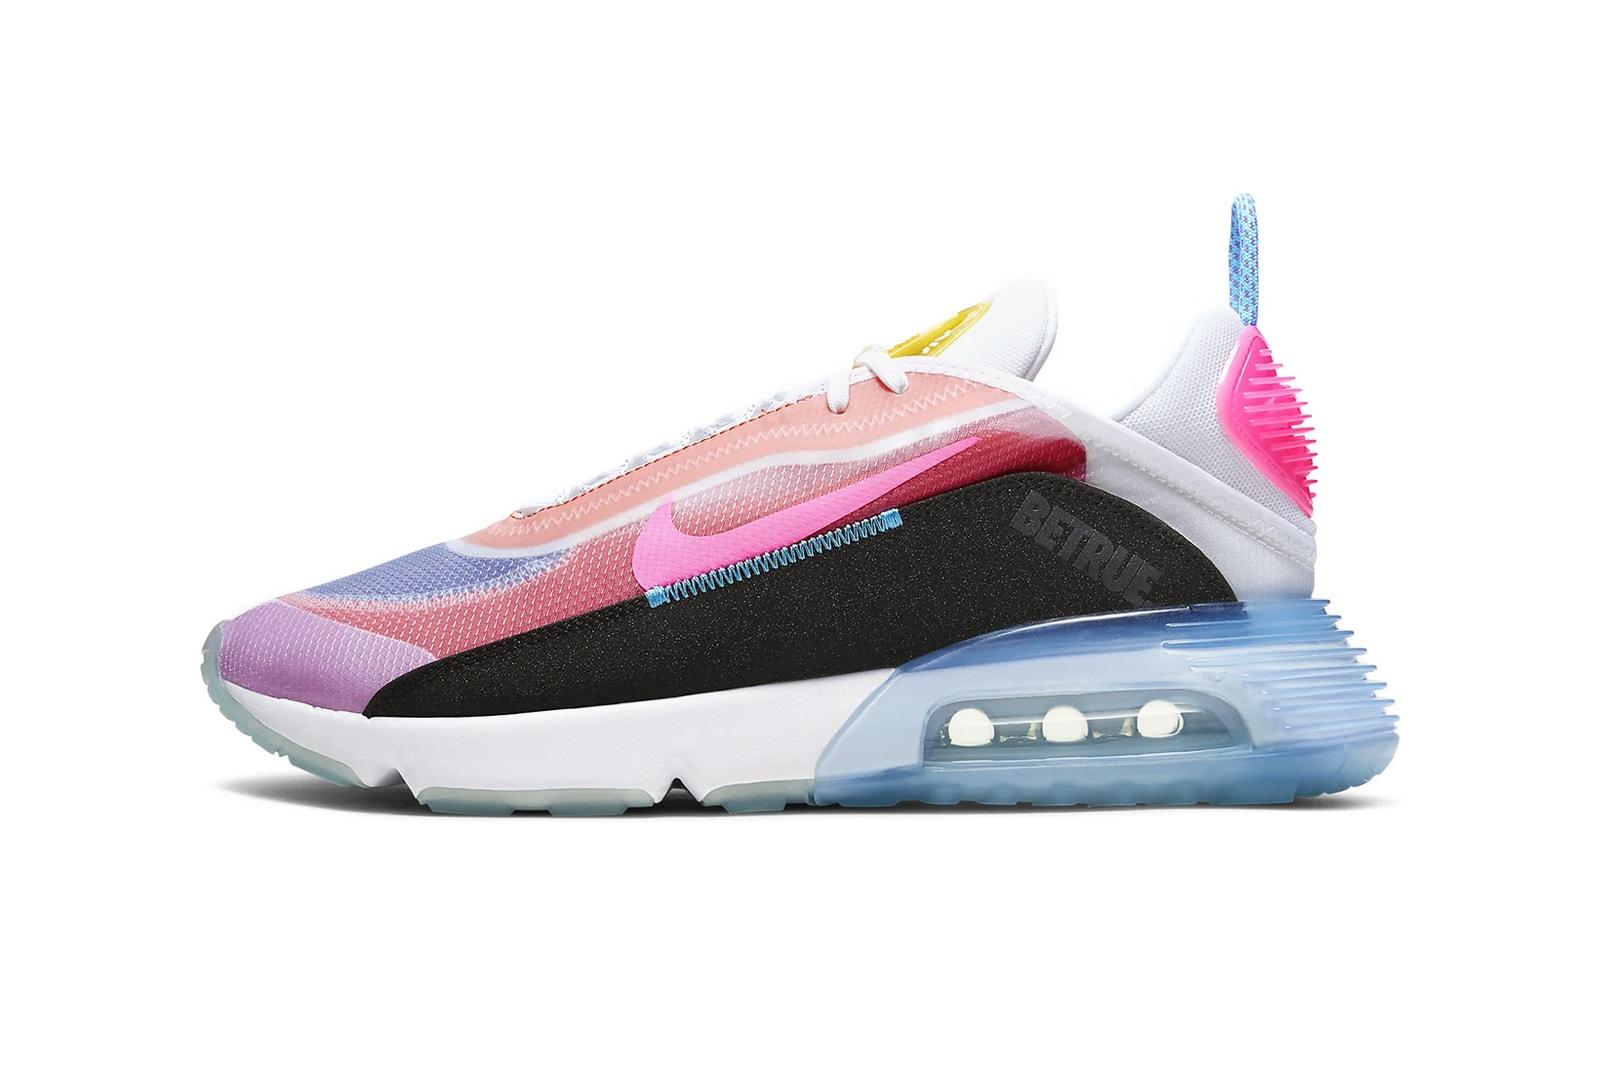 pride month sneakers lgbtq lgbt rainbow nike air force 1 converse chuck 70 hi